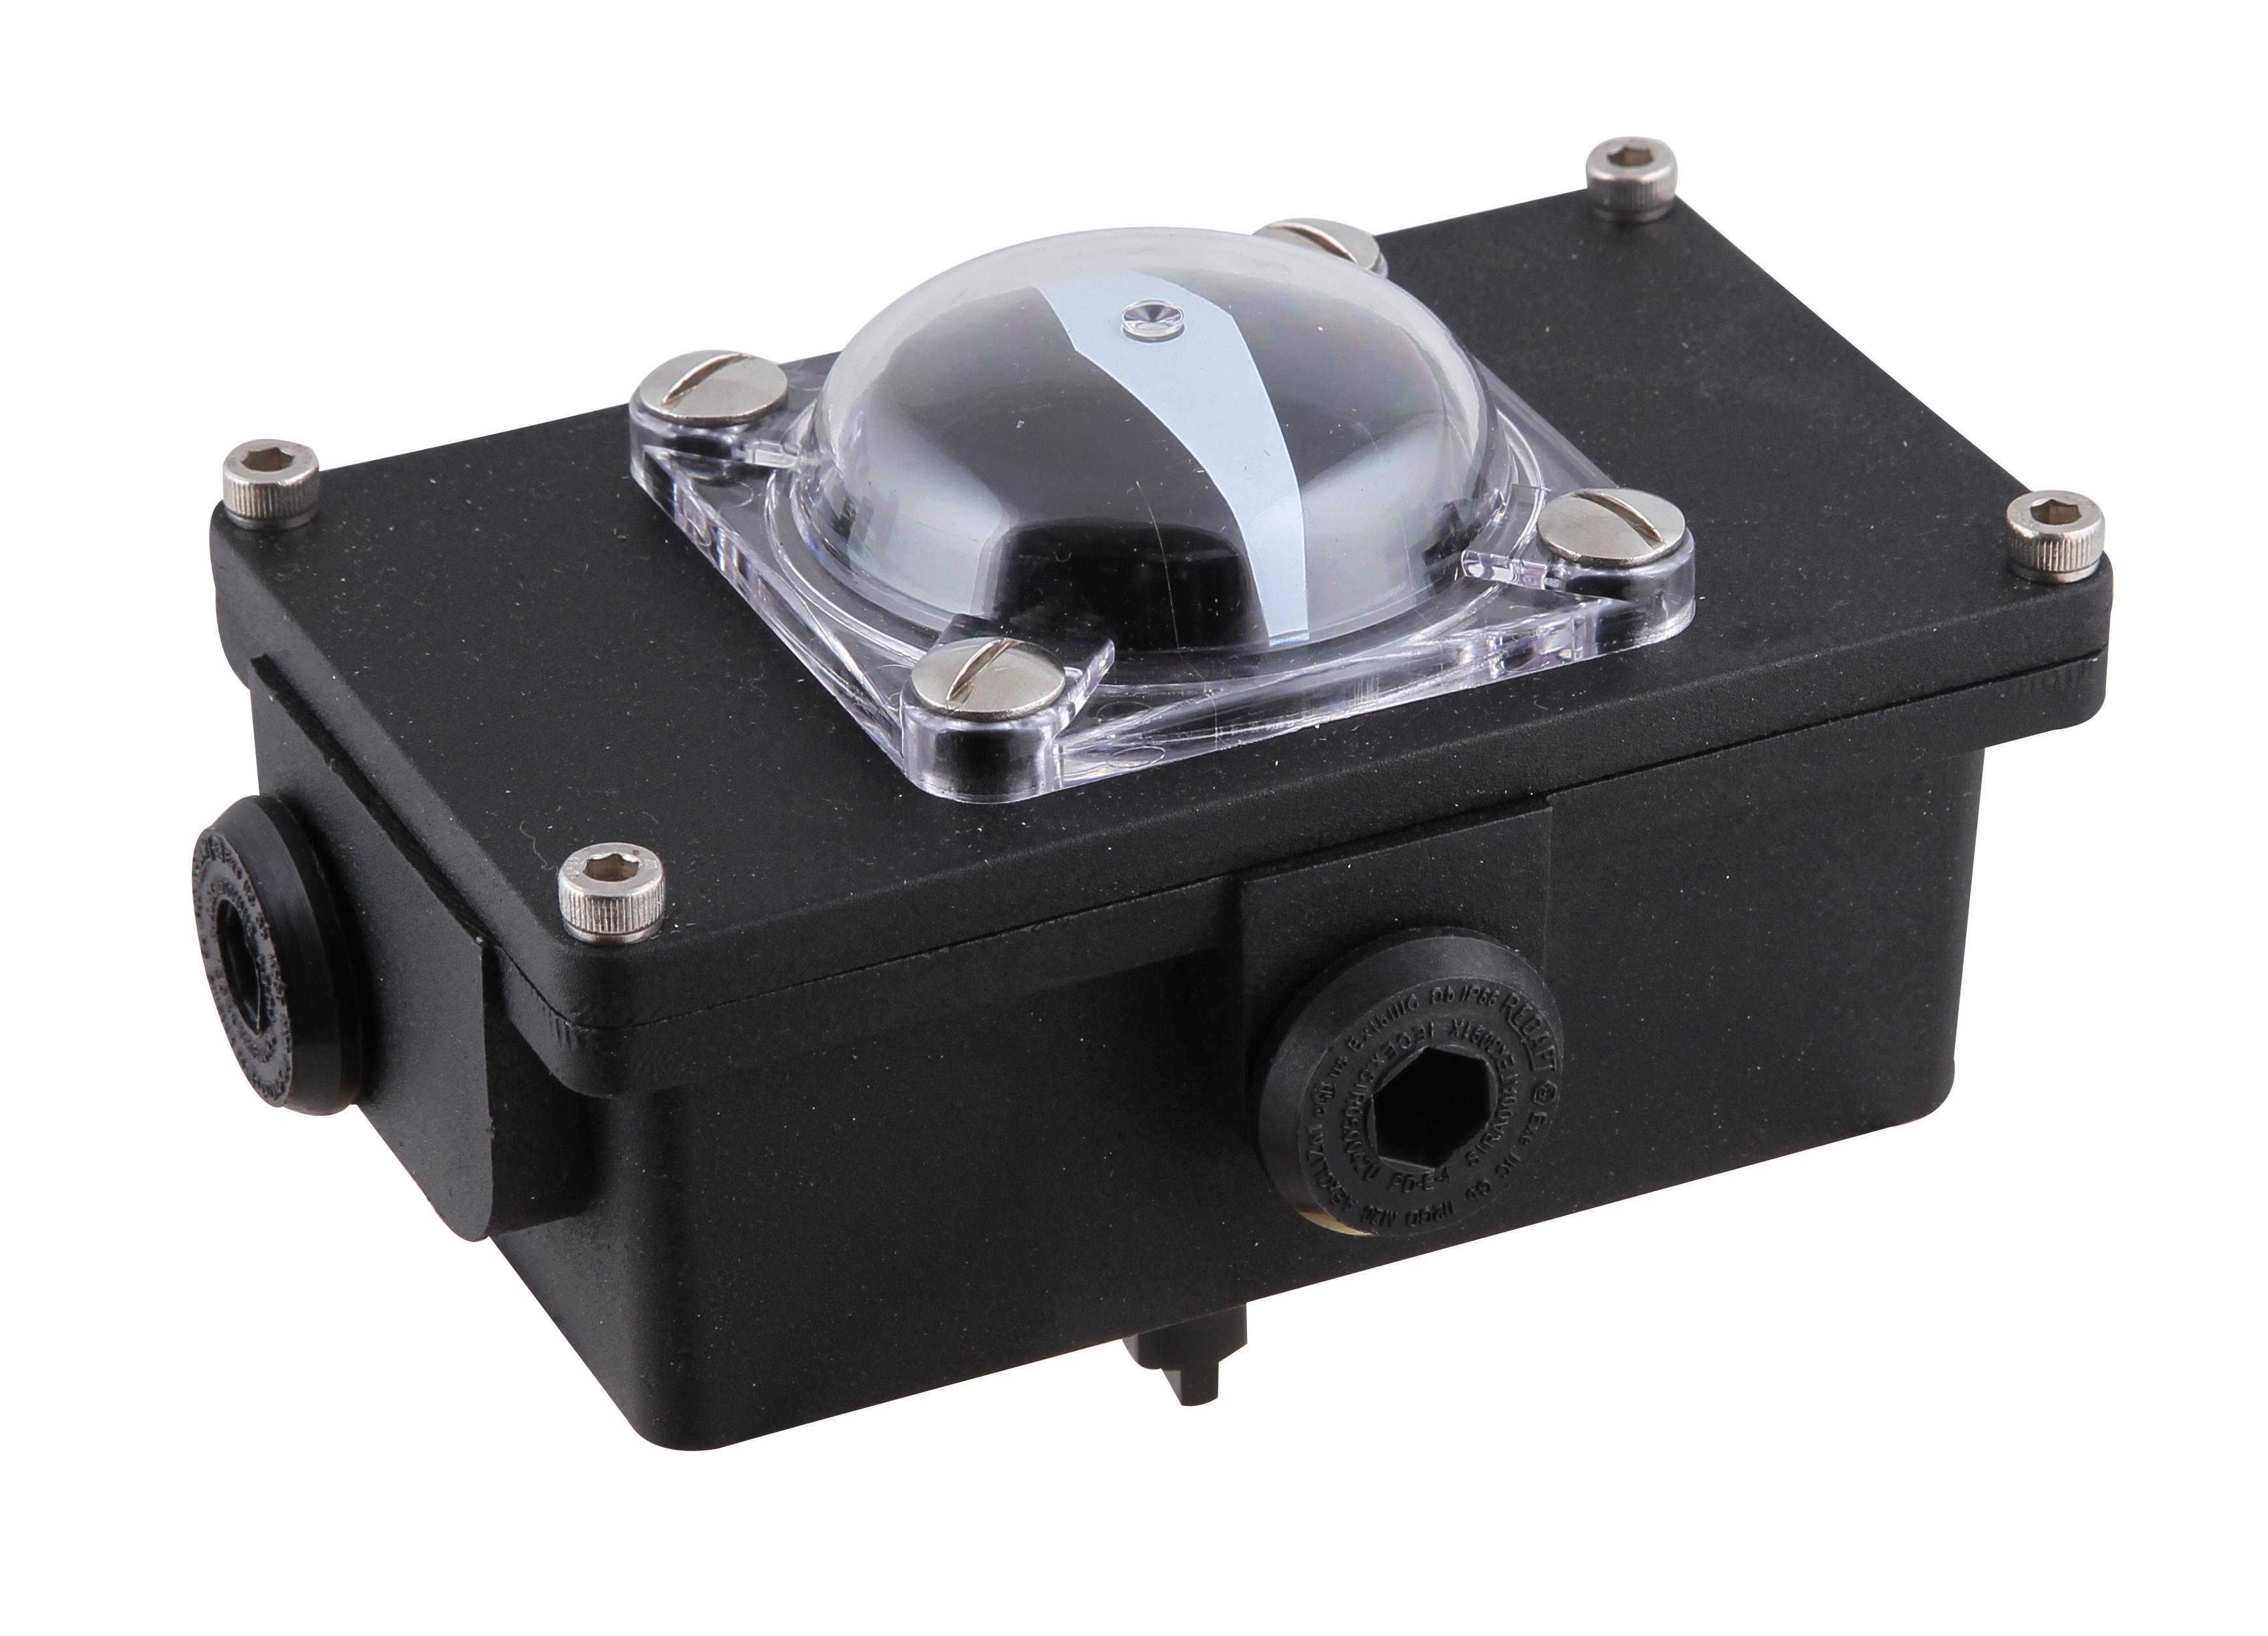 Keystone Tyco AVID LP Valve Position Monitor LP-0B201BN00-00-0R1 BOXED NEW